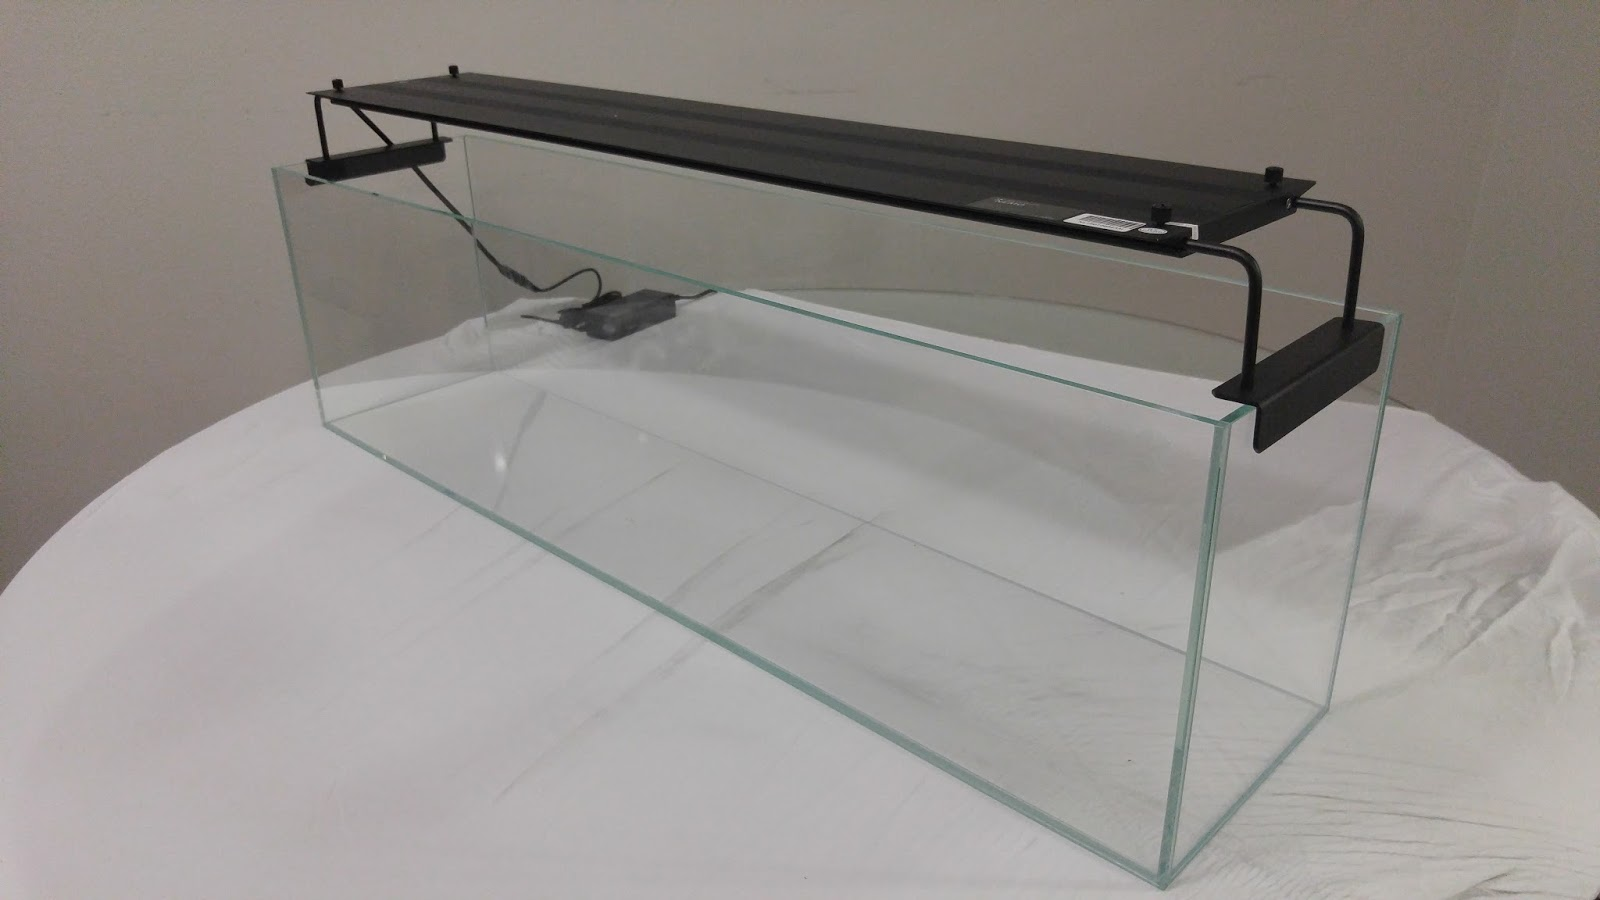 aquamaxx 12 gallon long rimless aquarium and nemolight. Black Bedroom Furniture Sets. Home Design Ideas